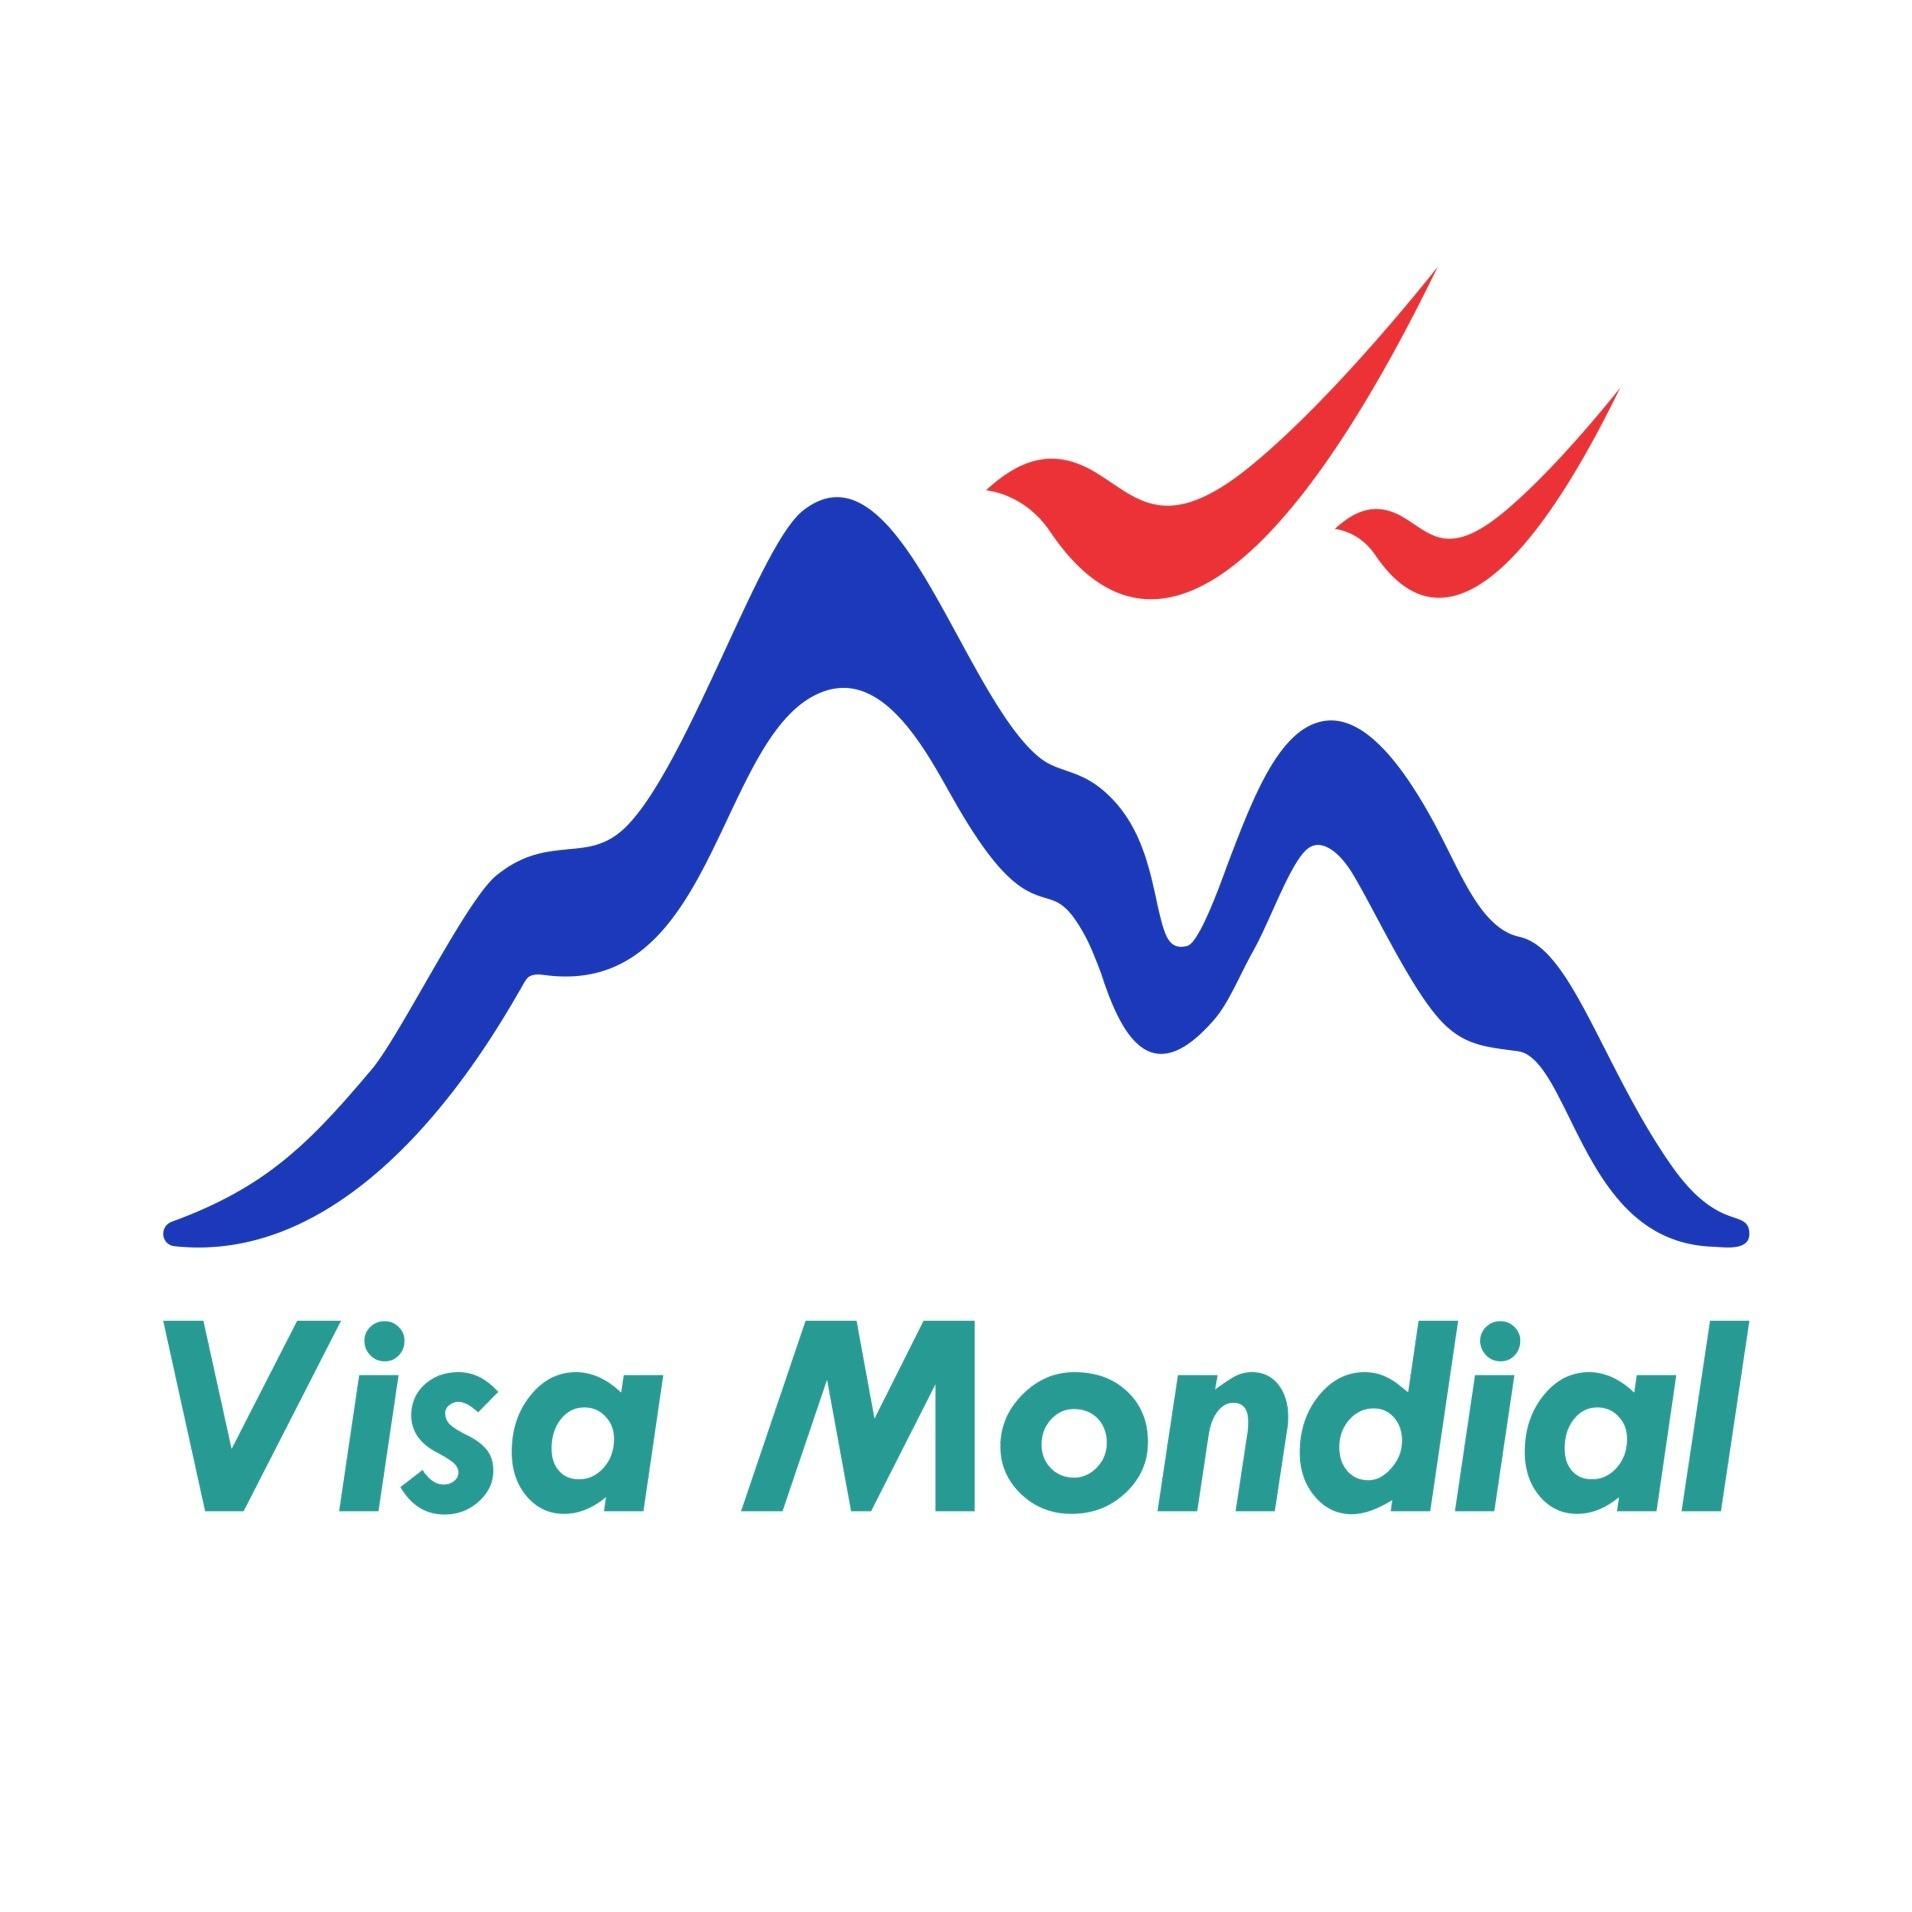 Visa Mondial